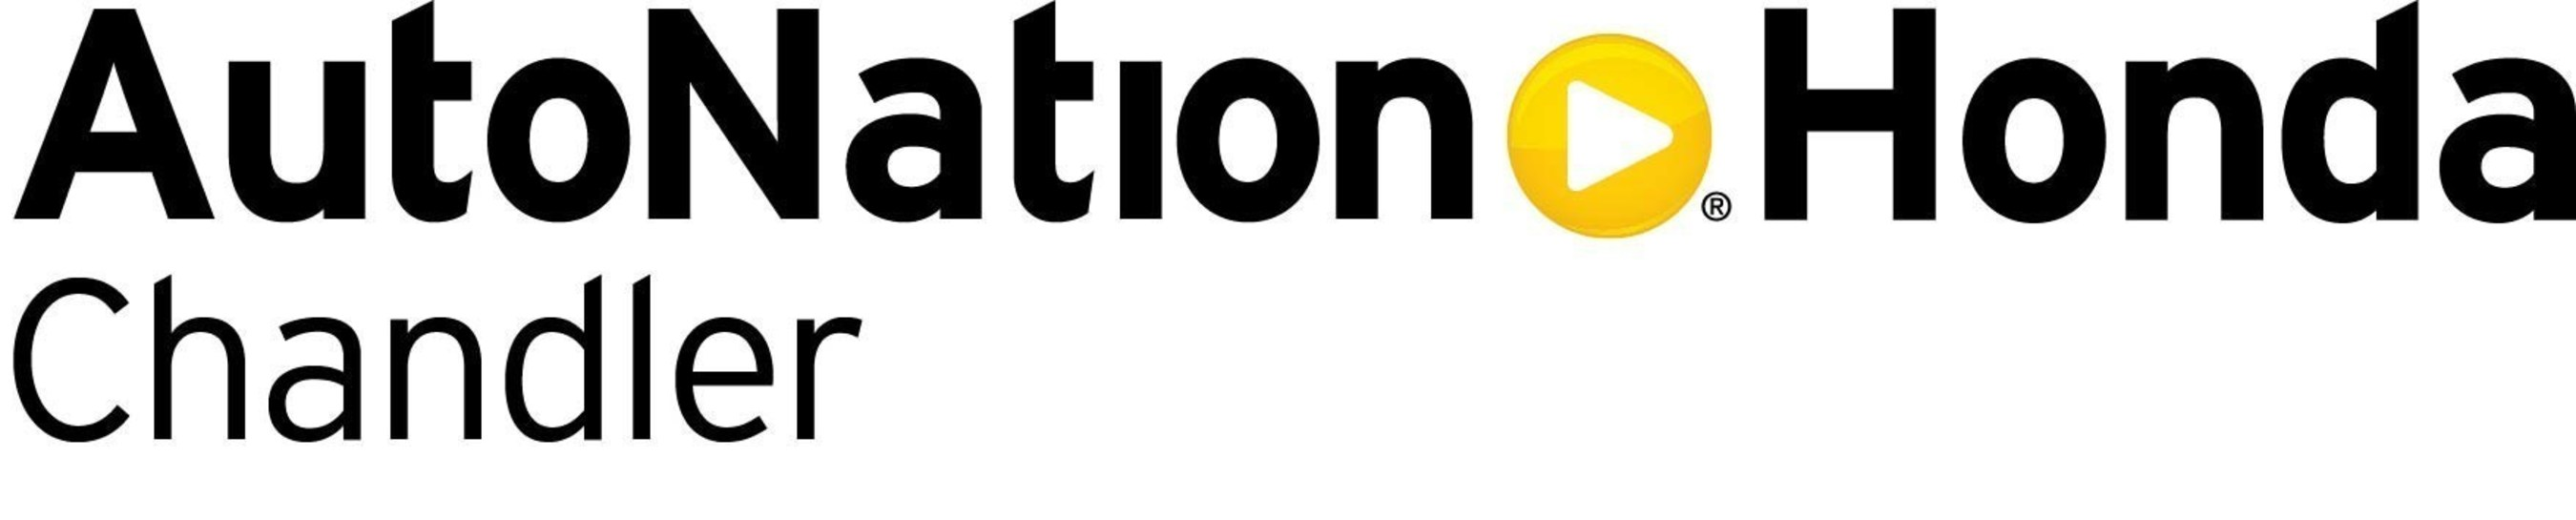 AutoNation Honda Chandler Logo